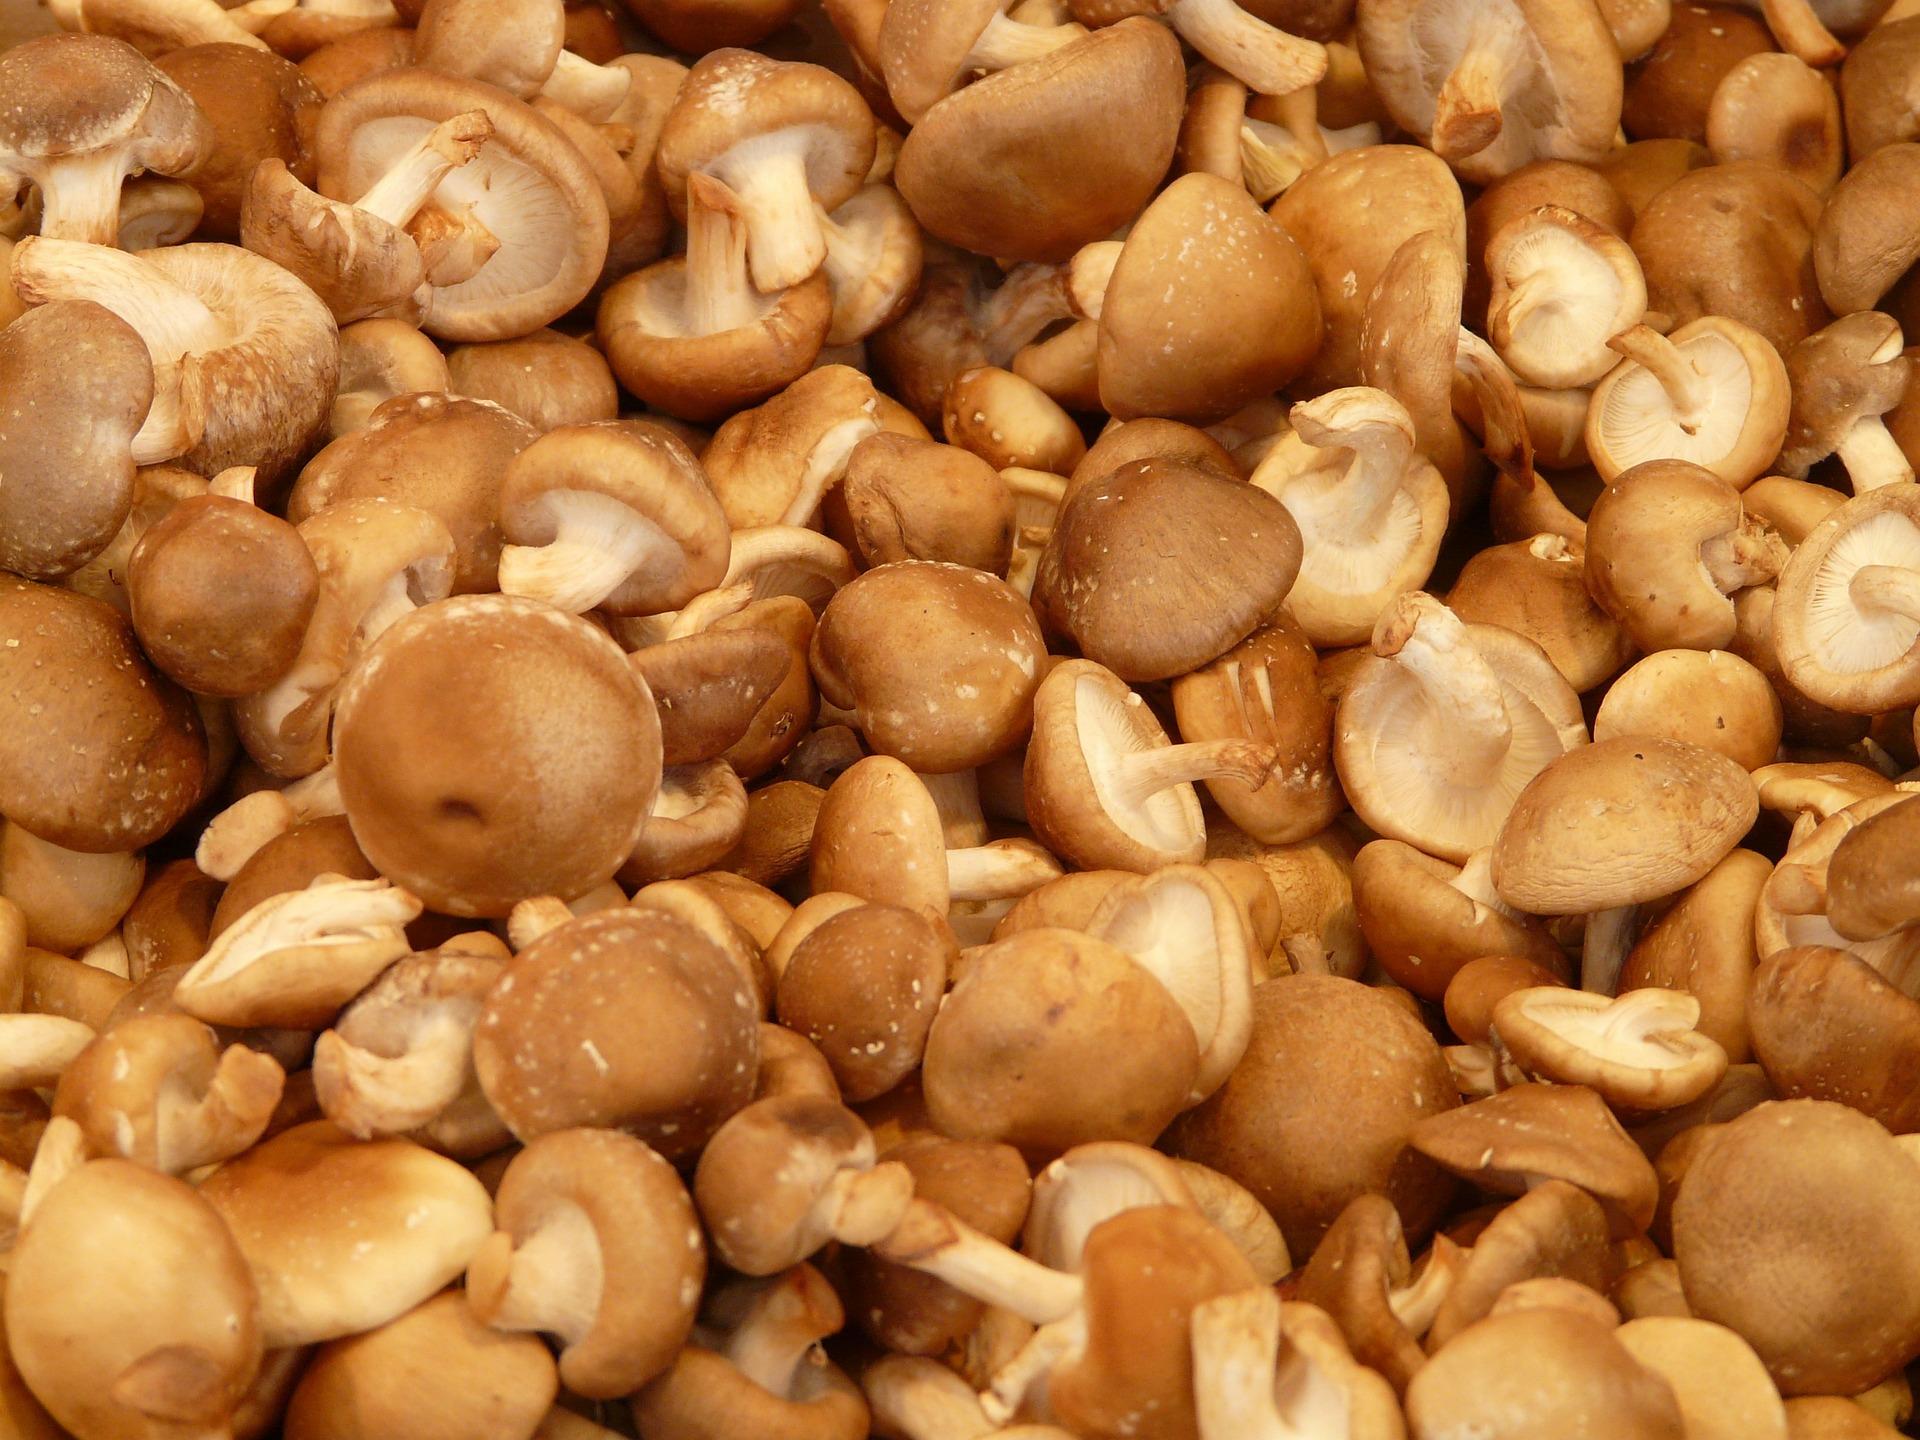 tons of shiitake mushrooms